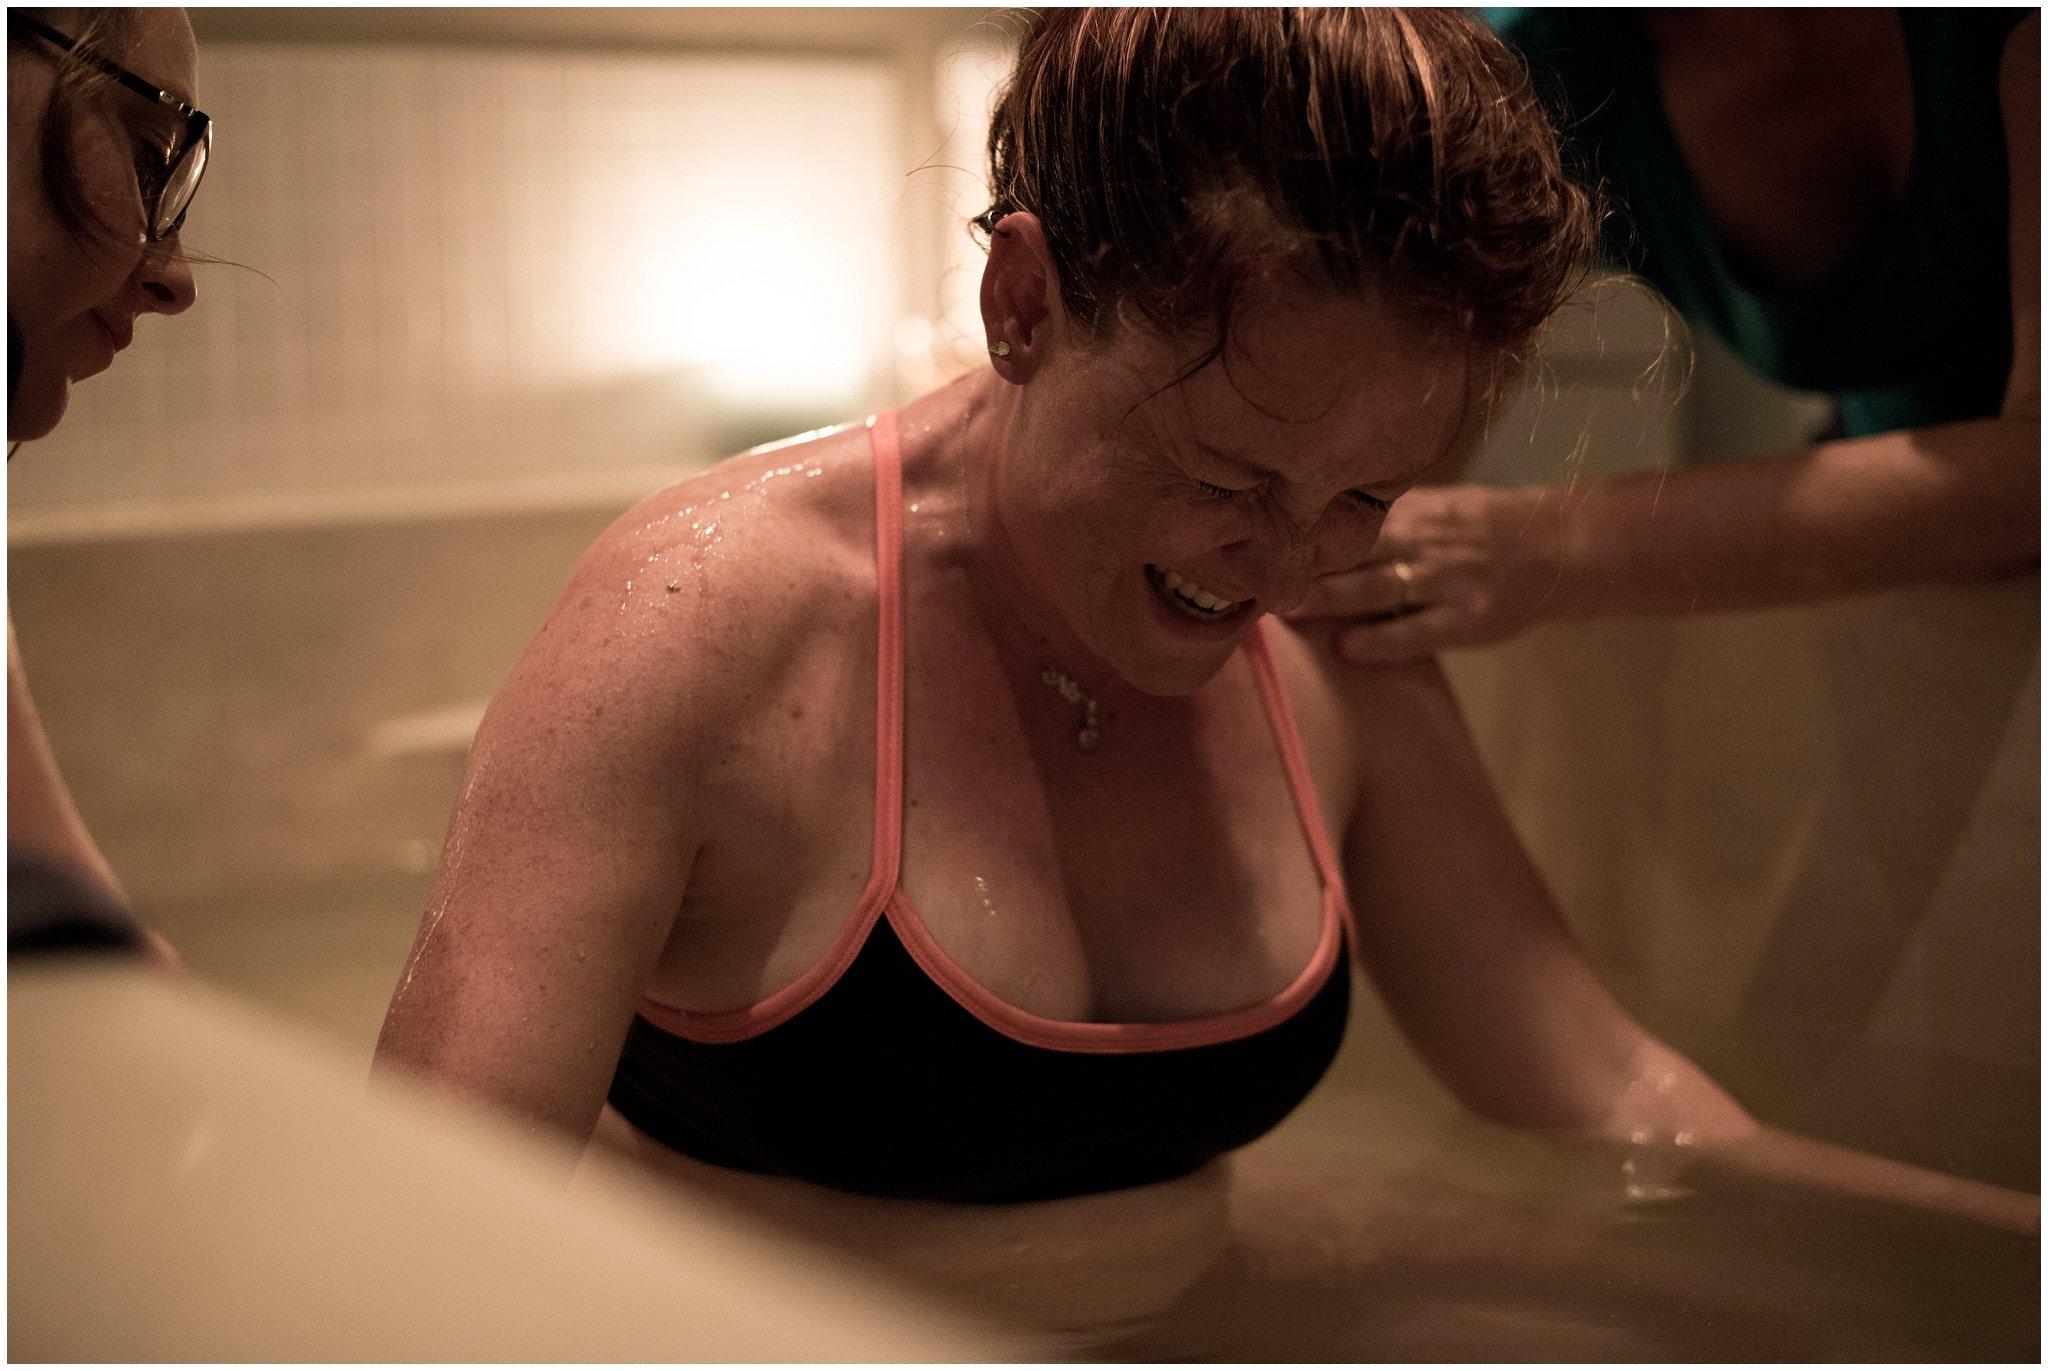 Water-birth-in-tub-at-hospital